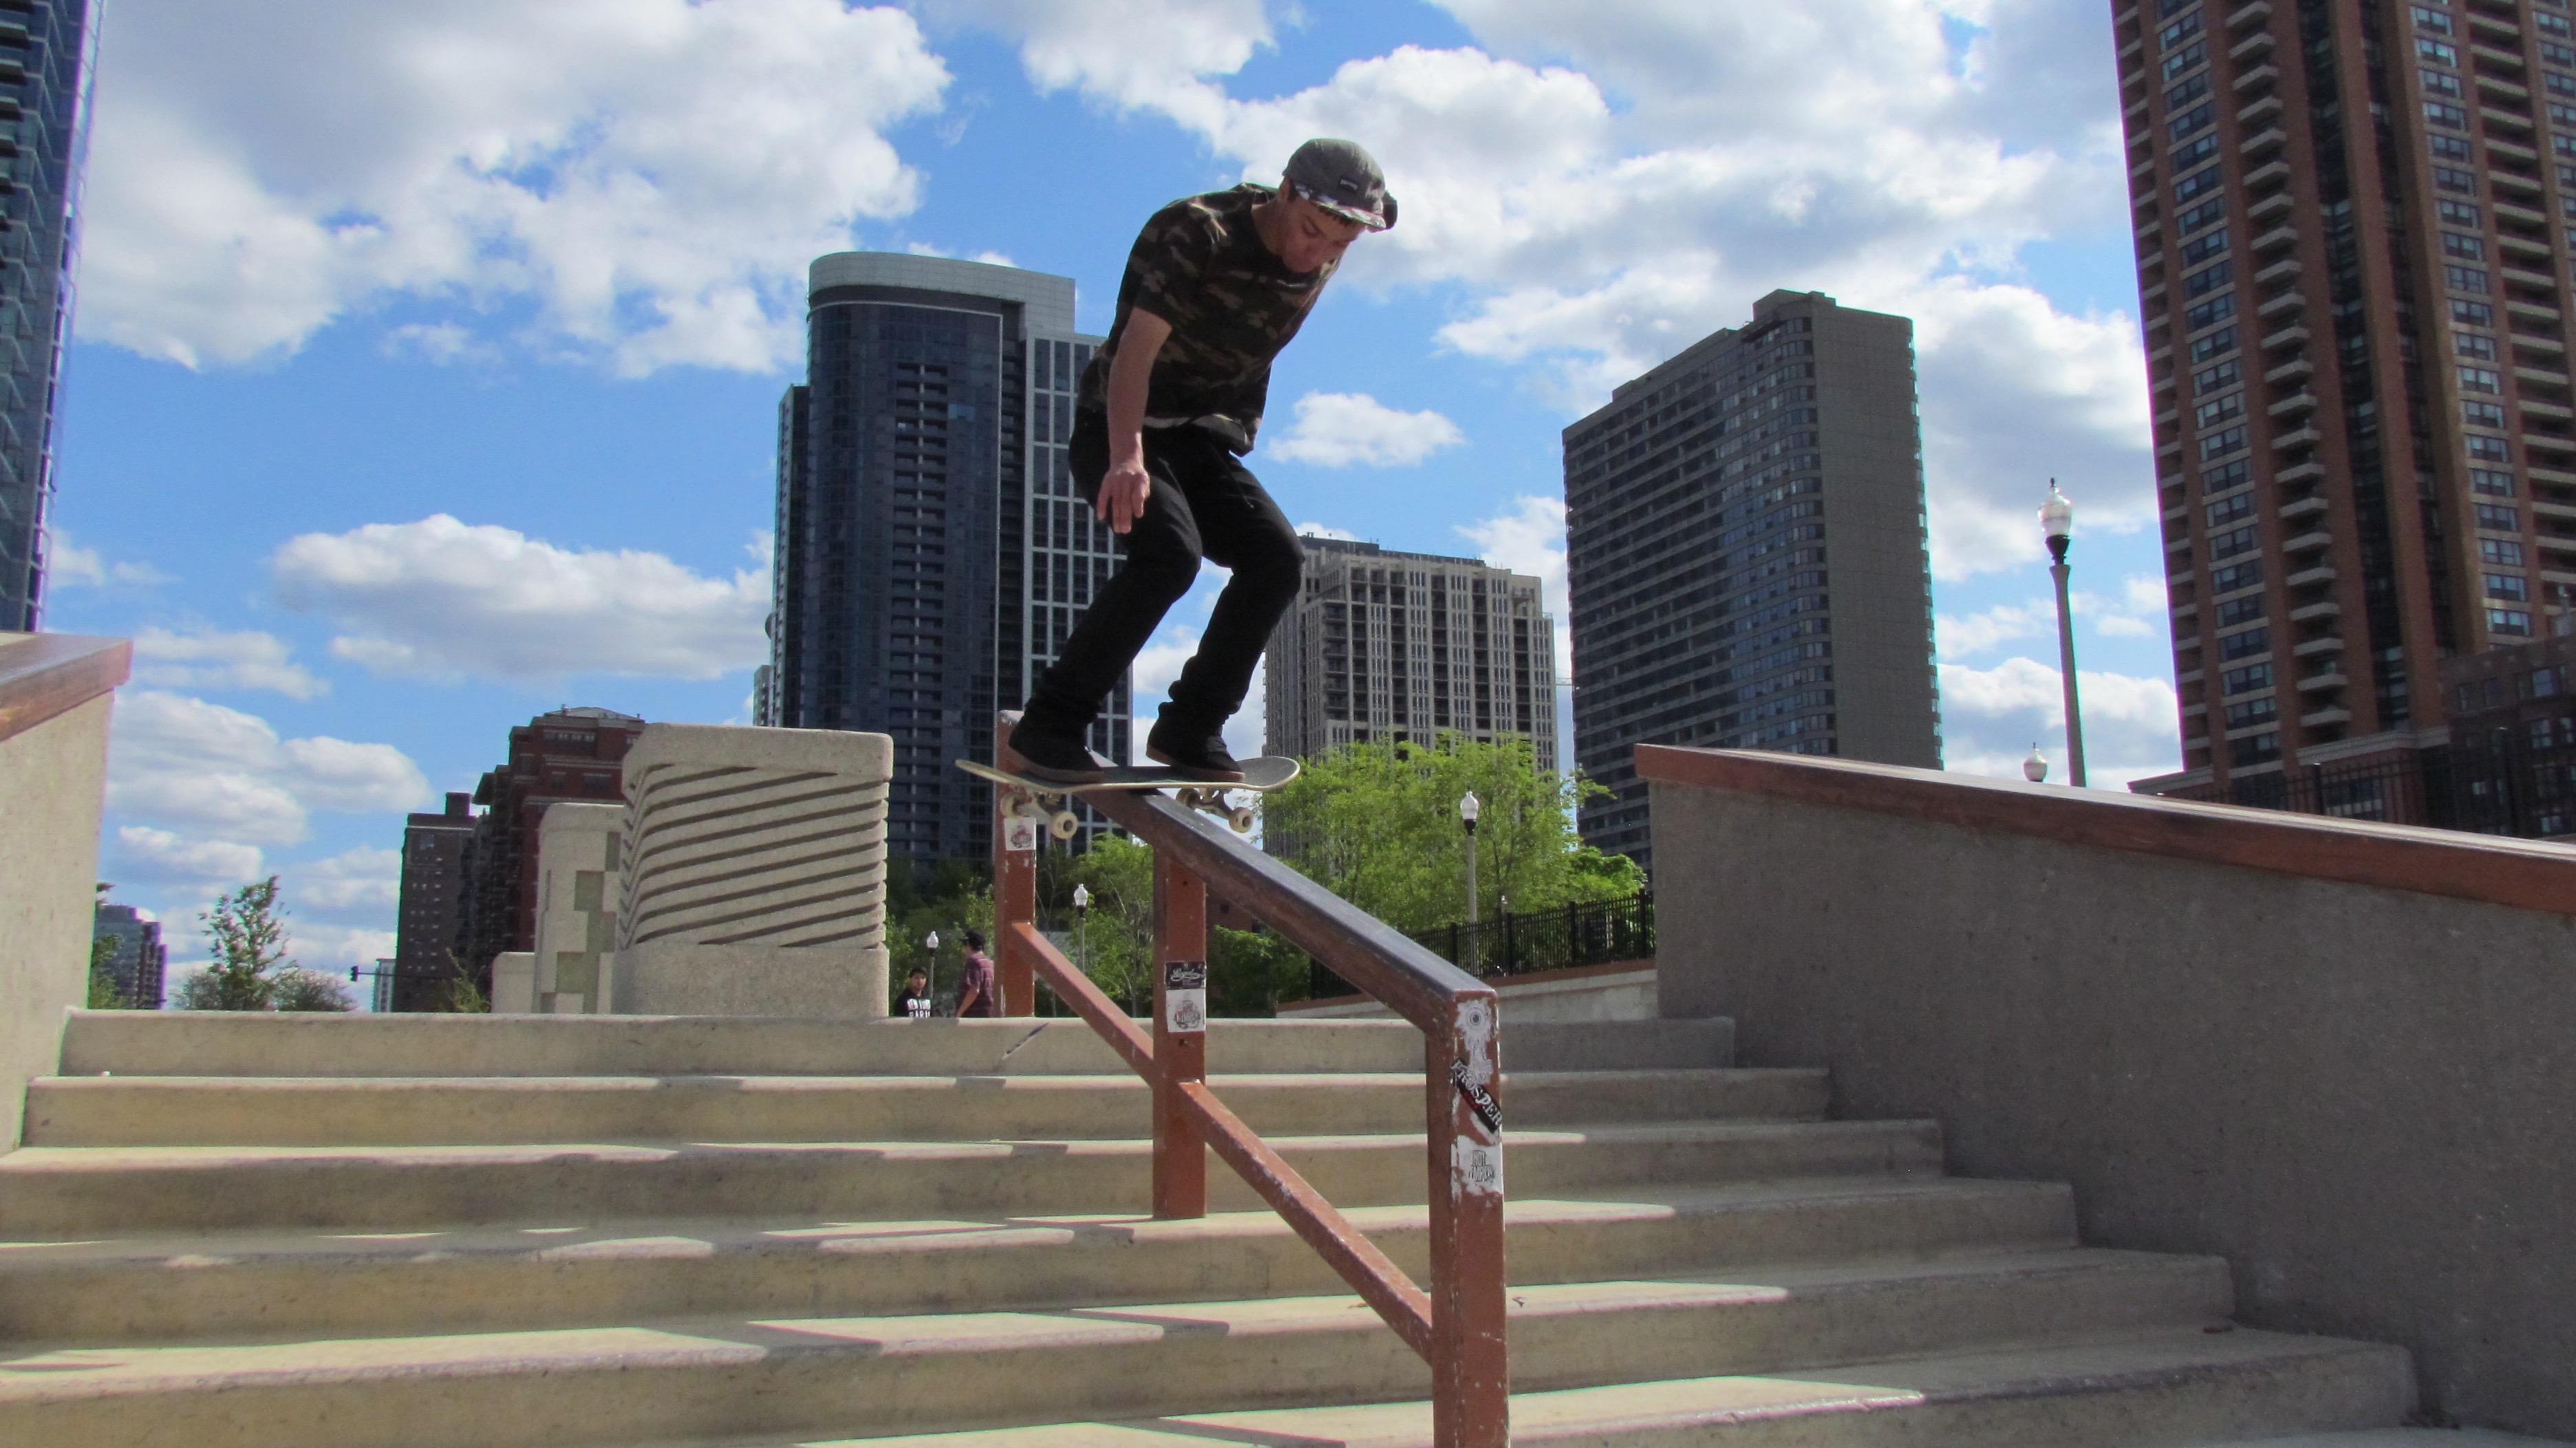 Grant Park Skate Park - 4